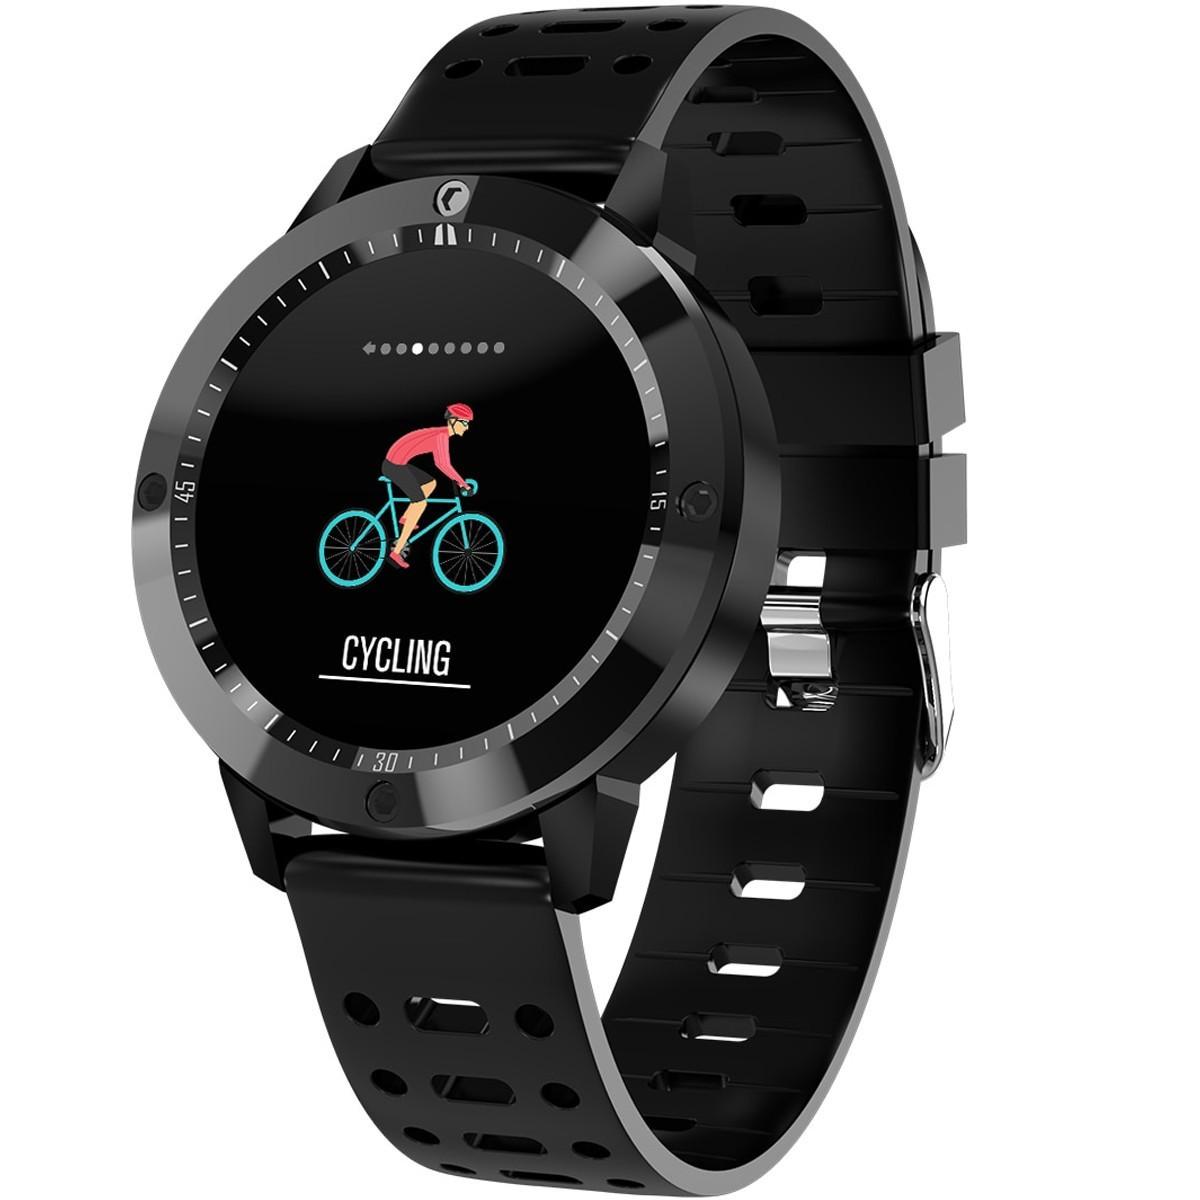 Bratara Fitness iUni CF58, Display OLED, Bluetooth, Pedometru, Monitorizare Puls, Notificari, Negru imagine techstar.ro 2021